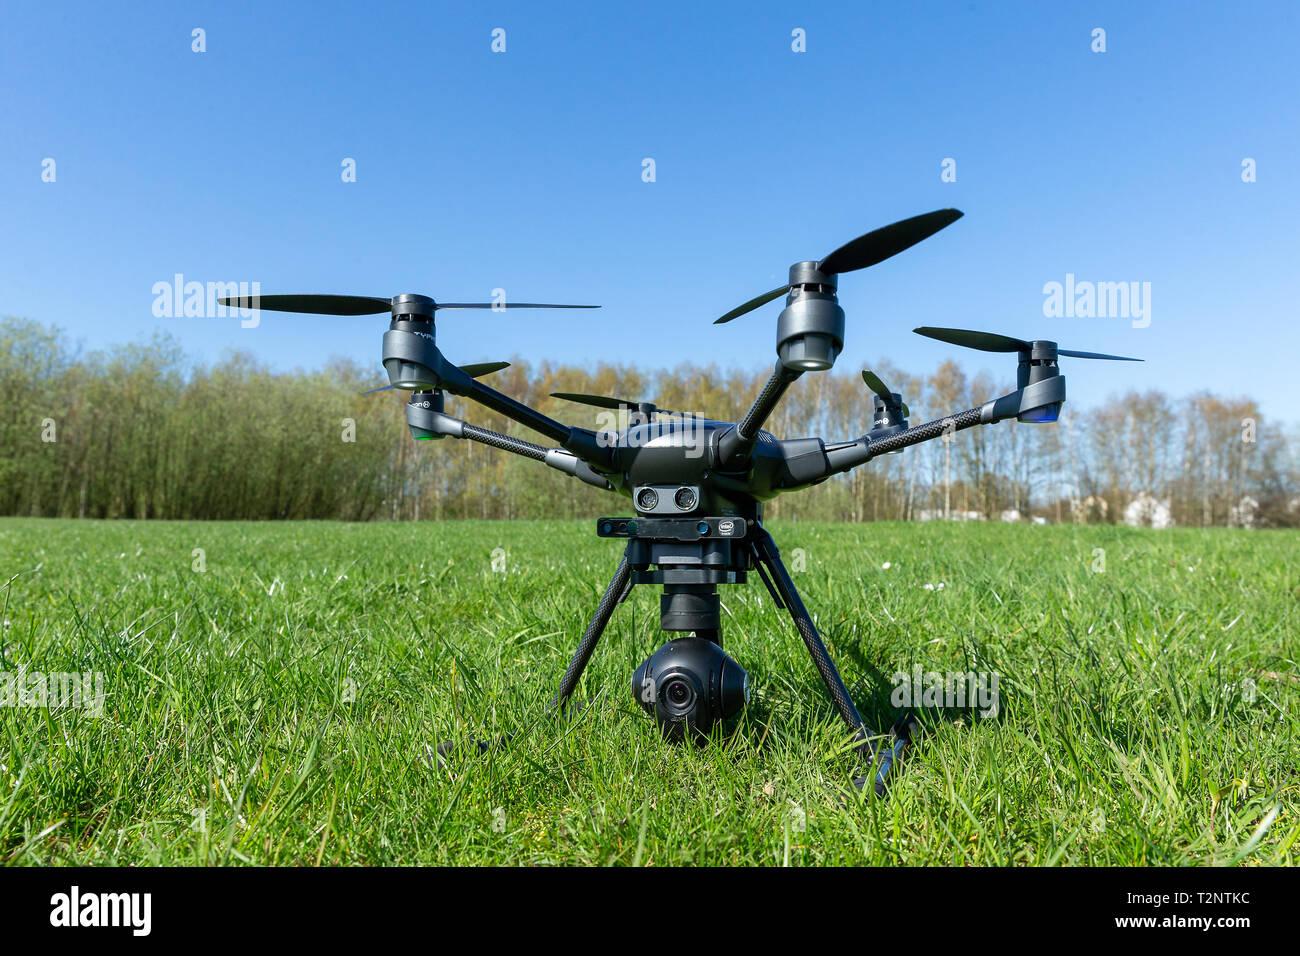 Drohne Yuneec Typhoon H, 01.04.2019  Foto: Mario Hommes - Stock Image